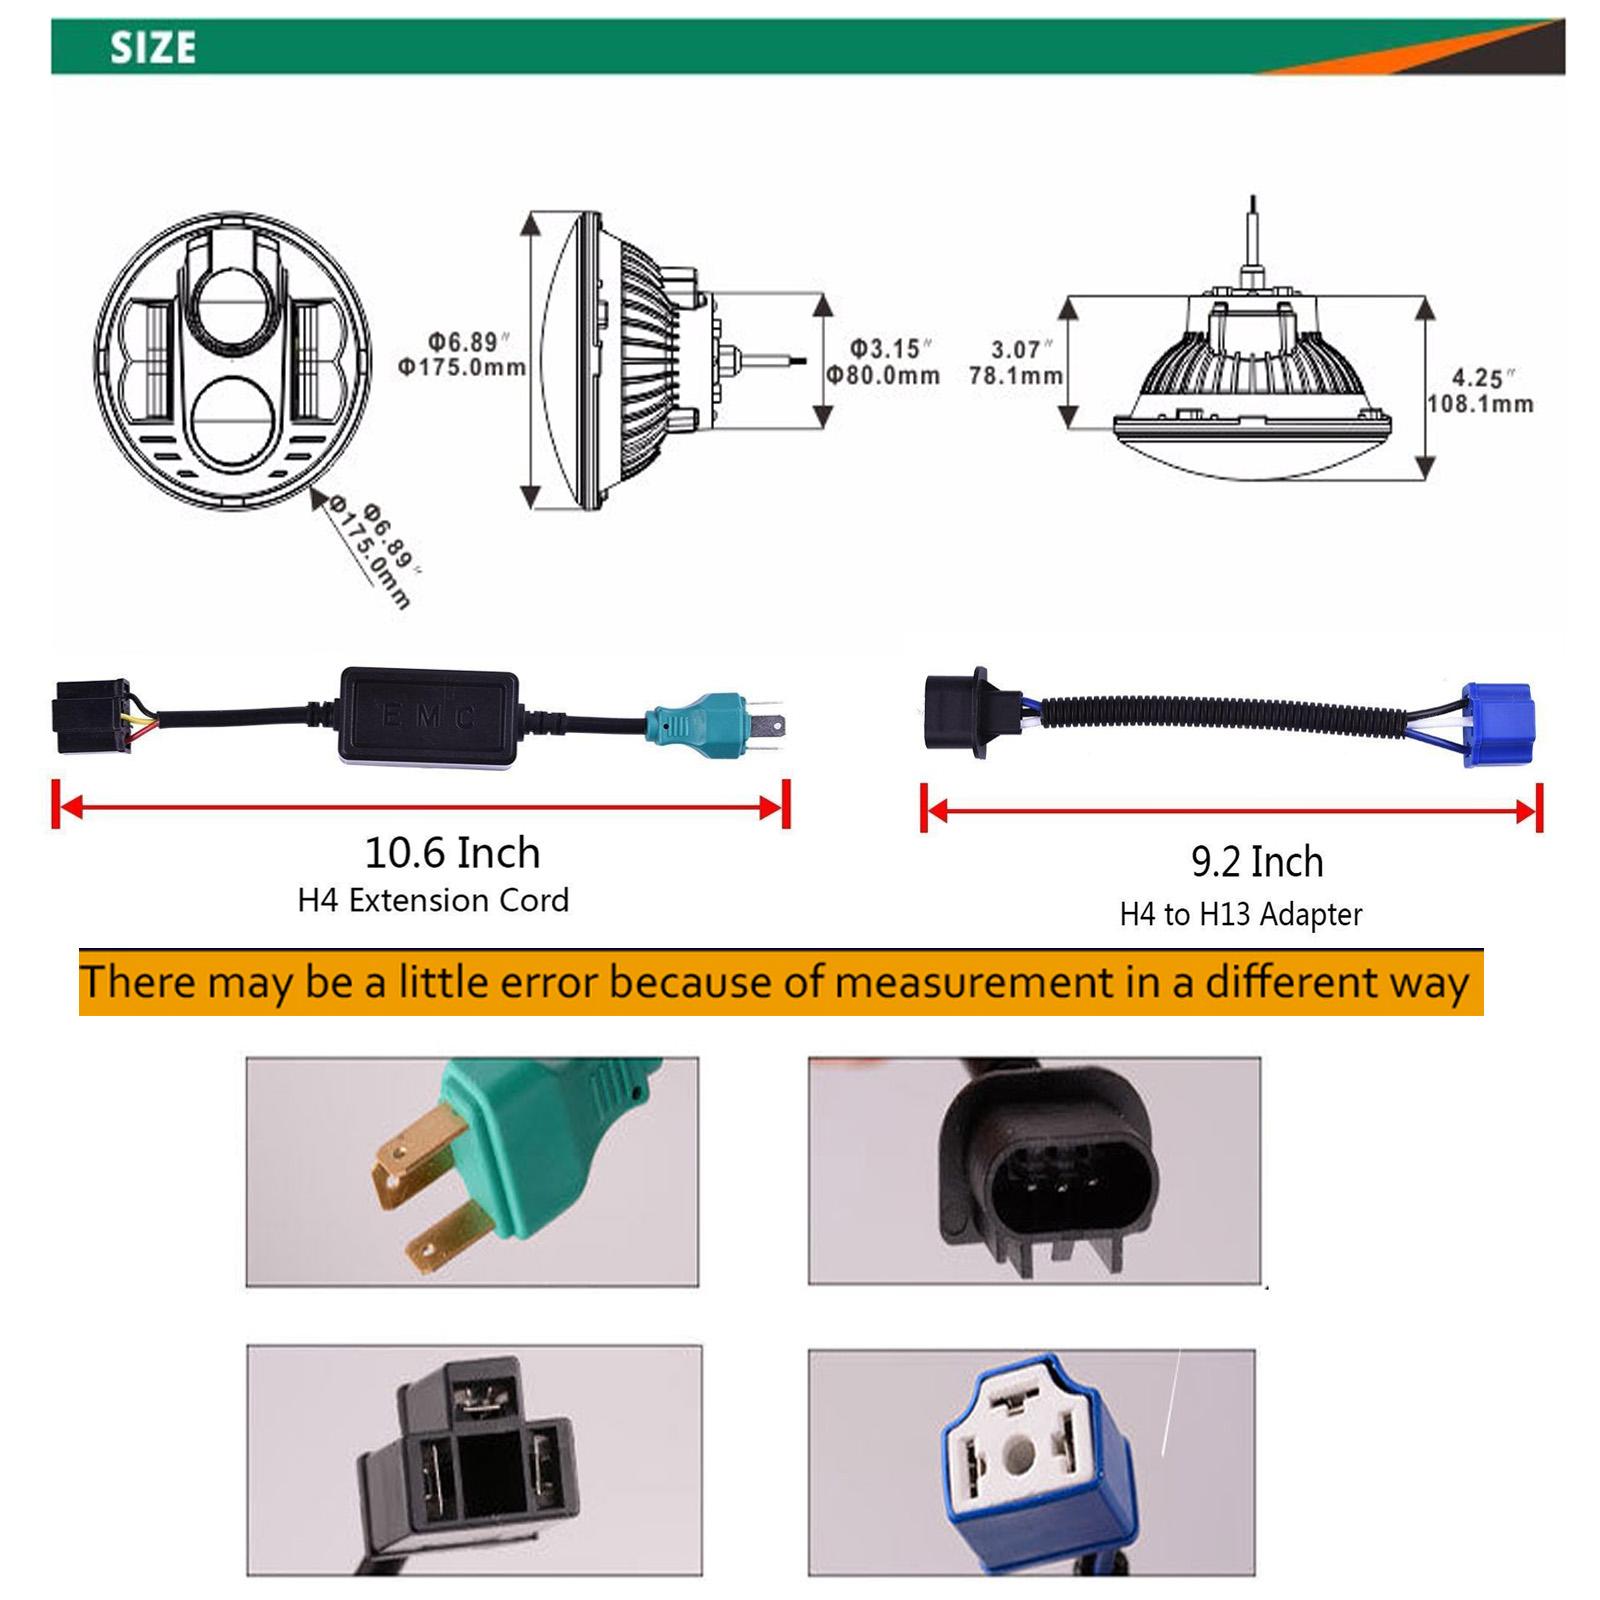 H H Wiring Diagram on h6054 wiring diagram, h4666 wiring diagram, h4656 wiring diagram,